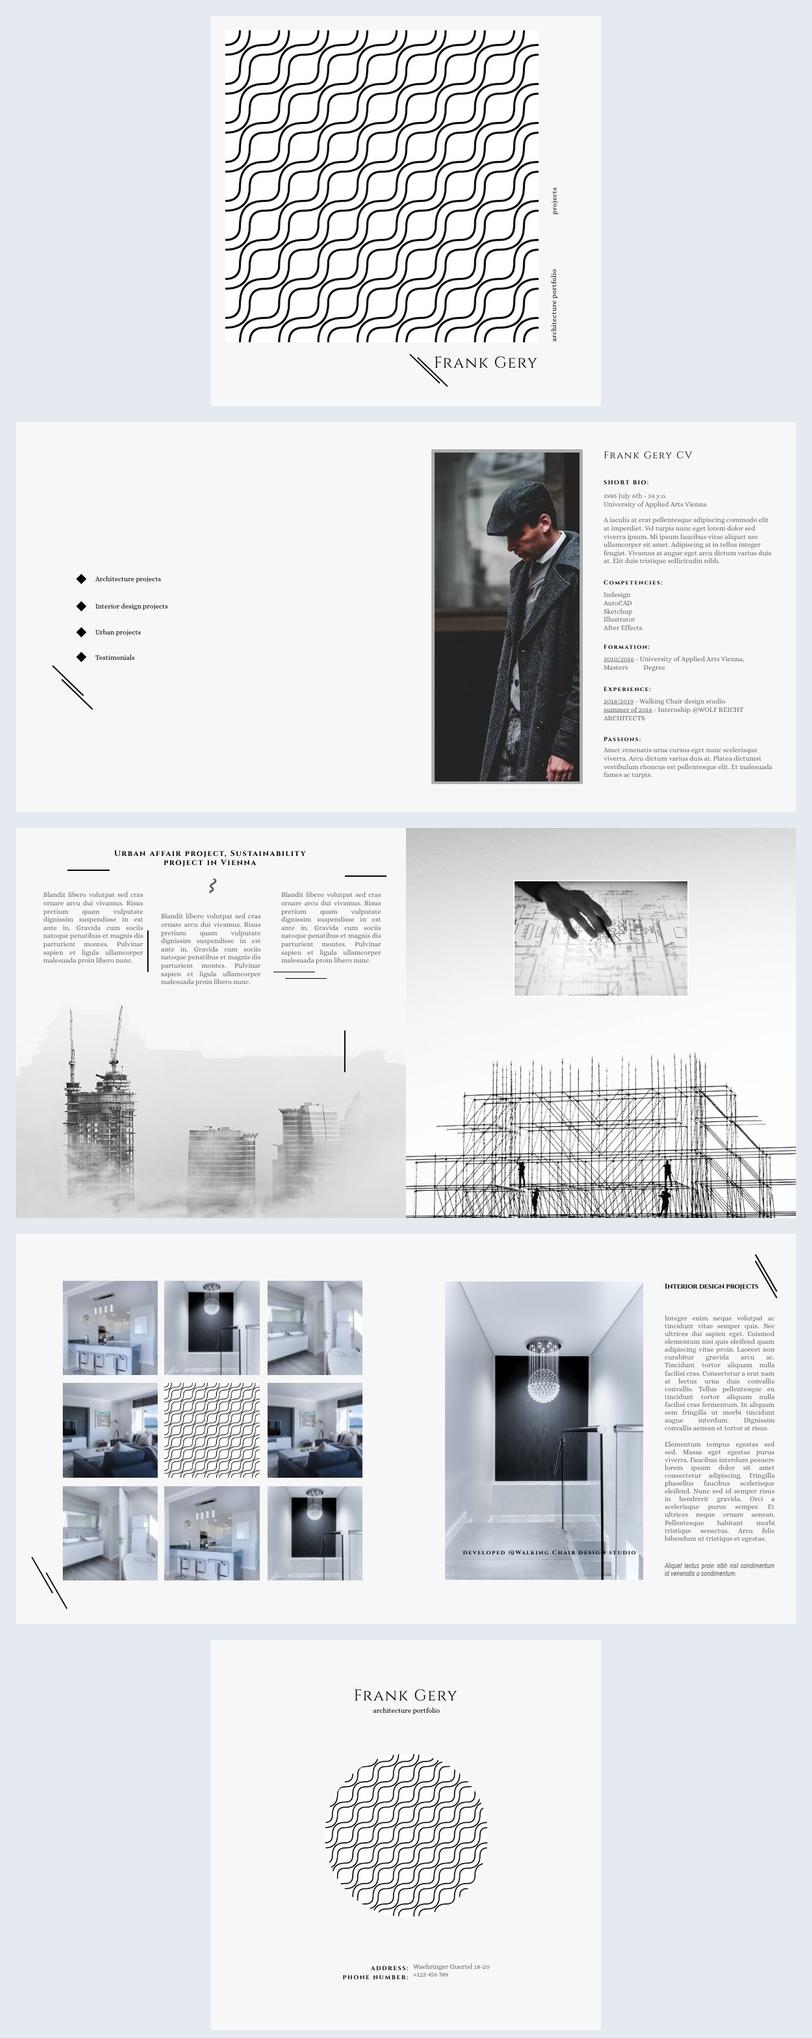 Architekturportfolio-Vorlagendesign